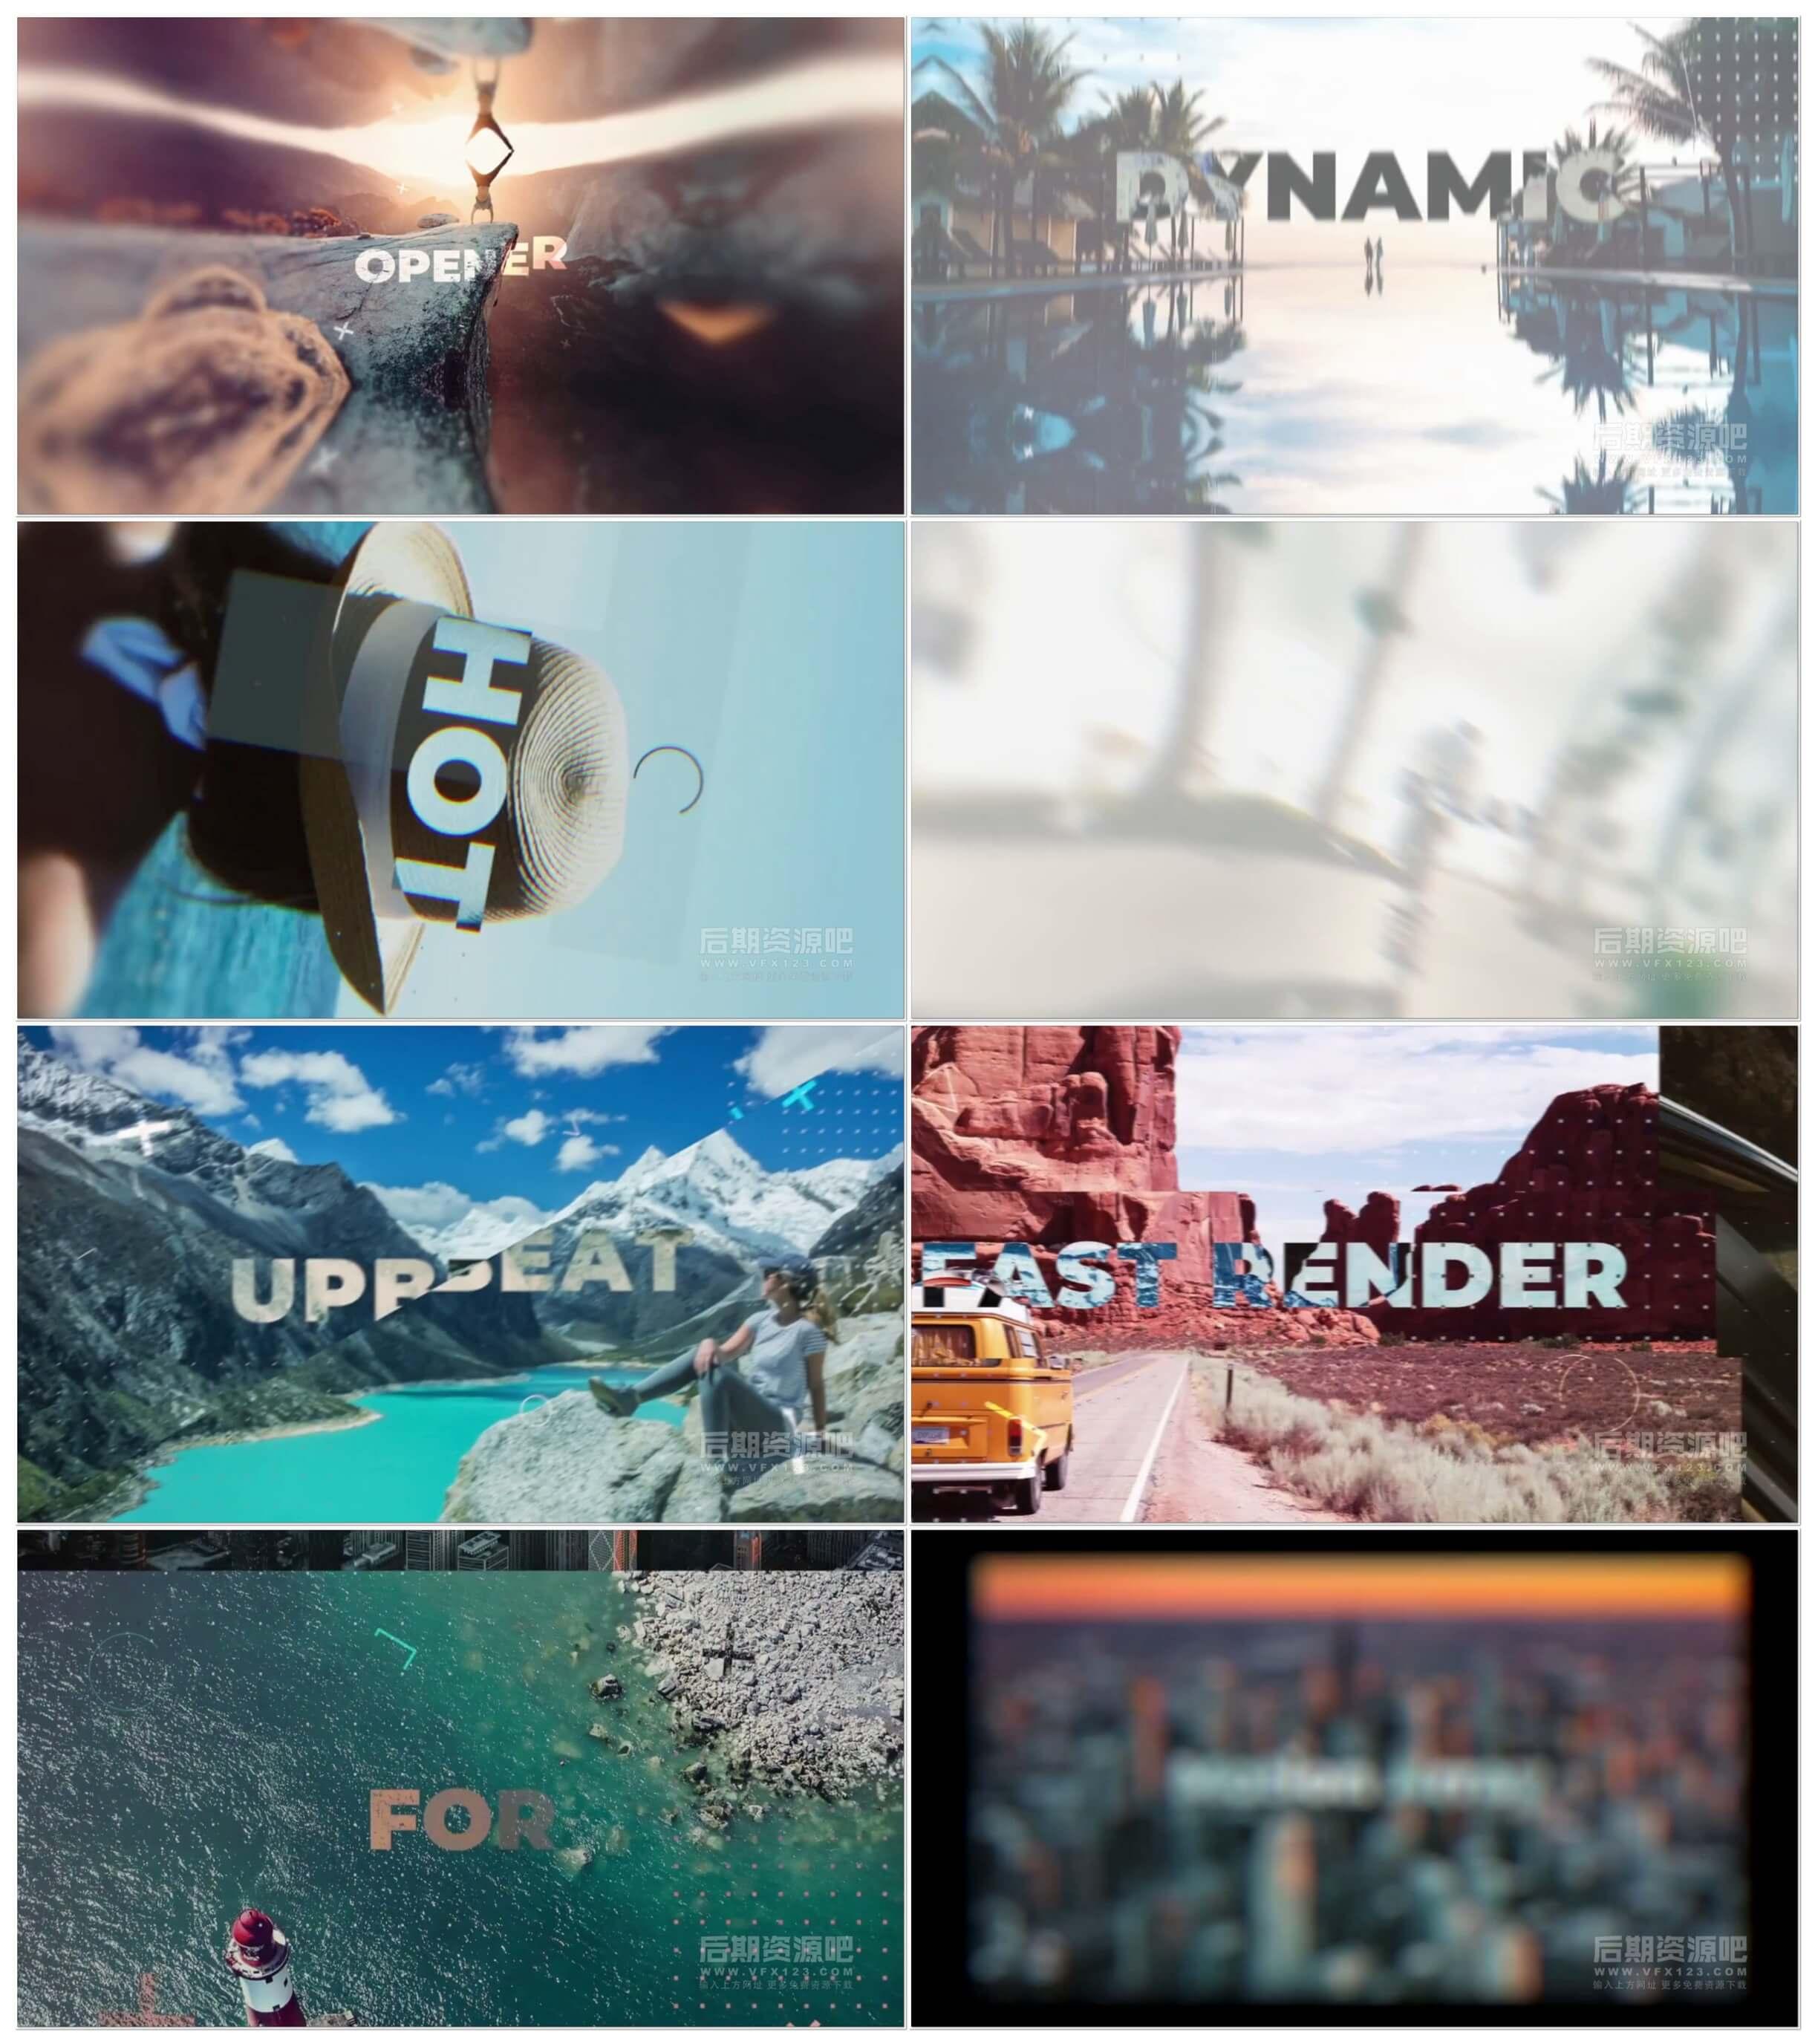 fcpx插件 炫酷快节奏预告片片头常用素材包 带工程文件 Summer Opener